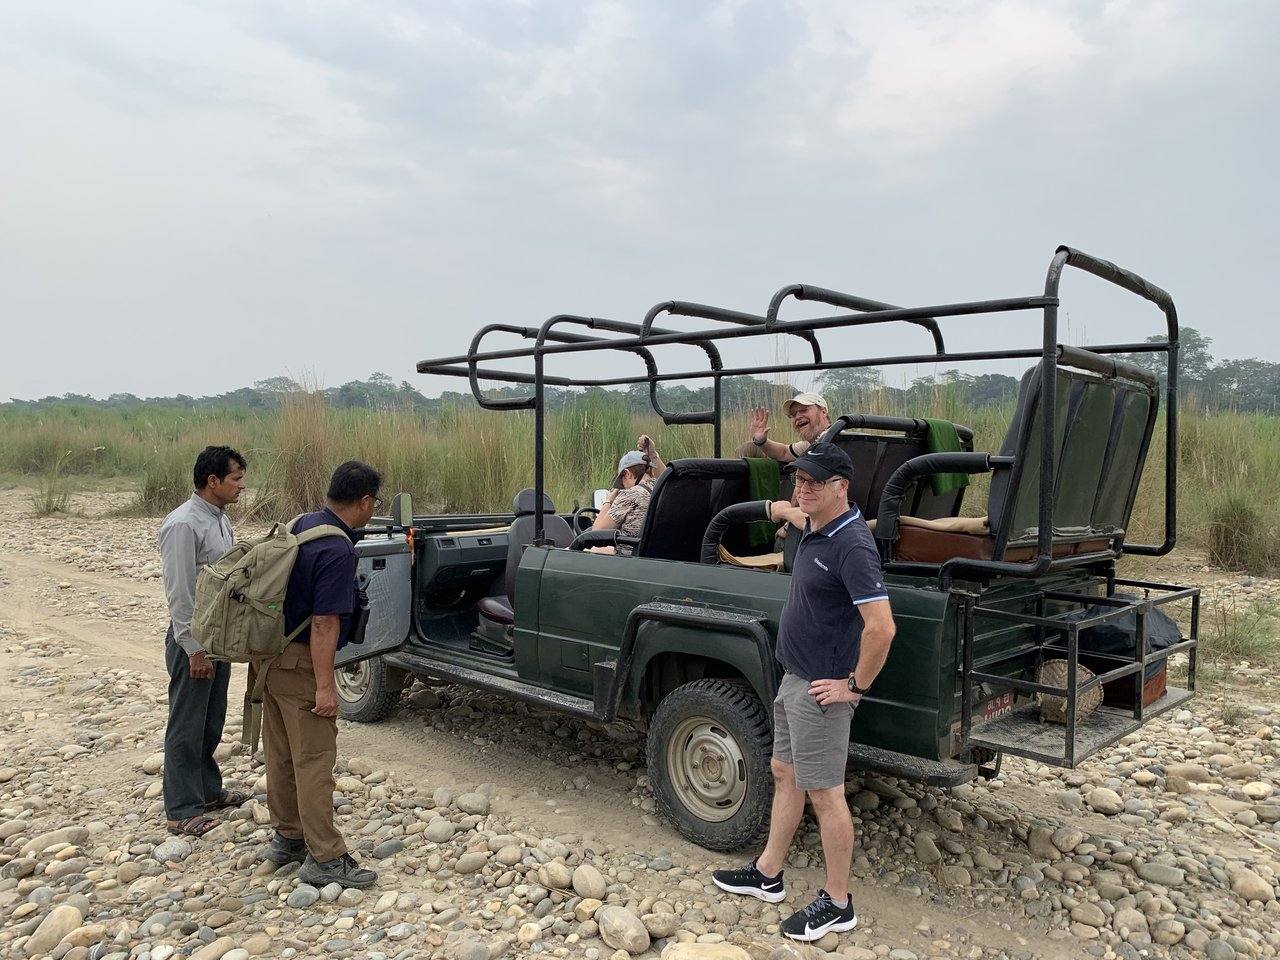 Jeep safari with Hari   Photo taken by Caroline R